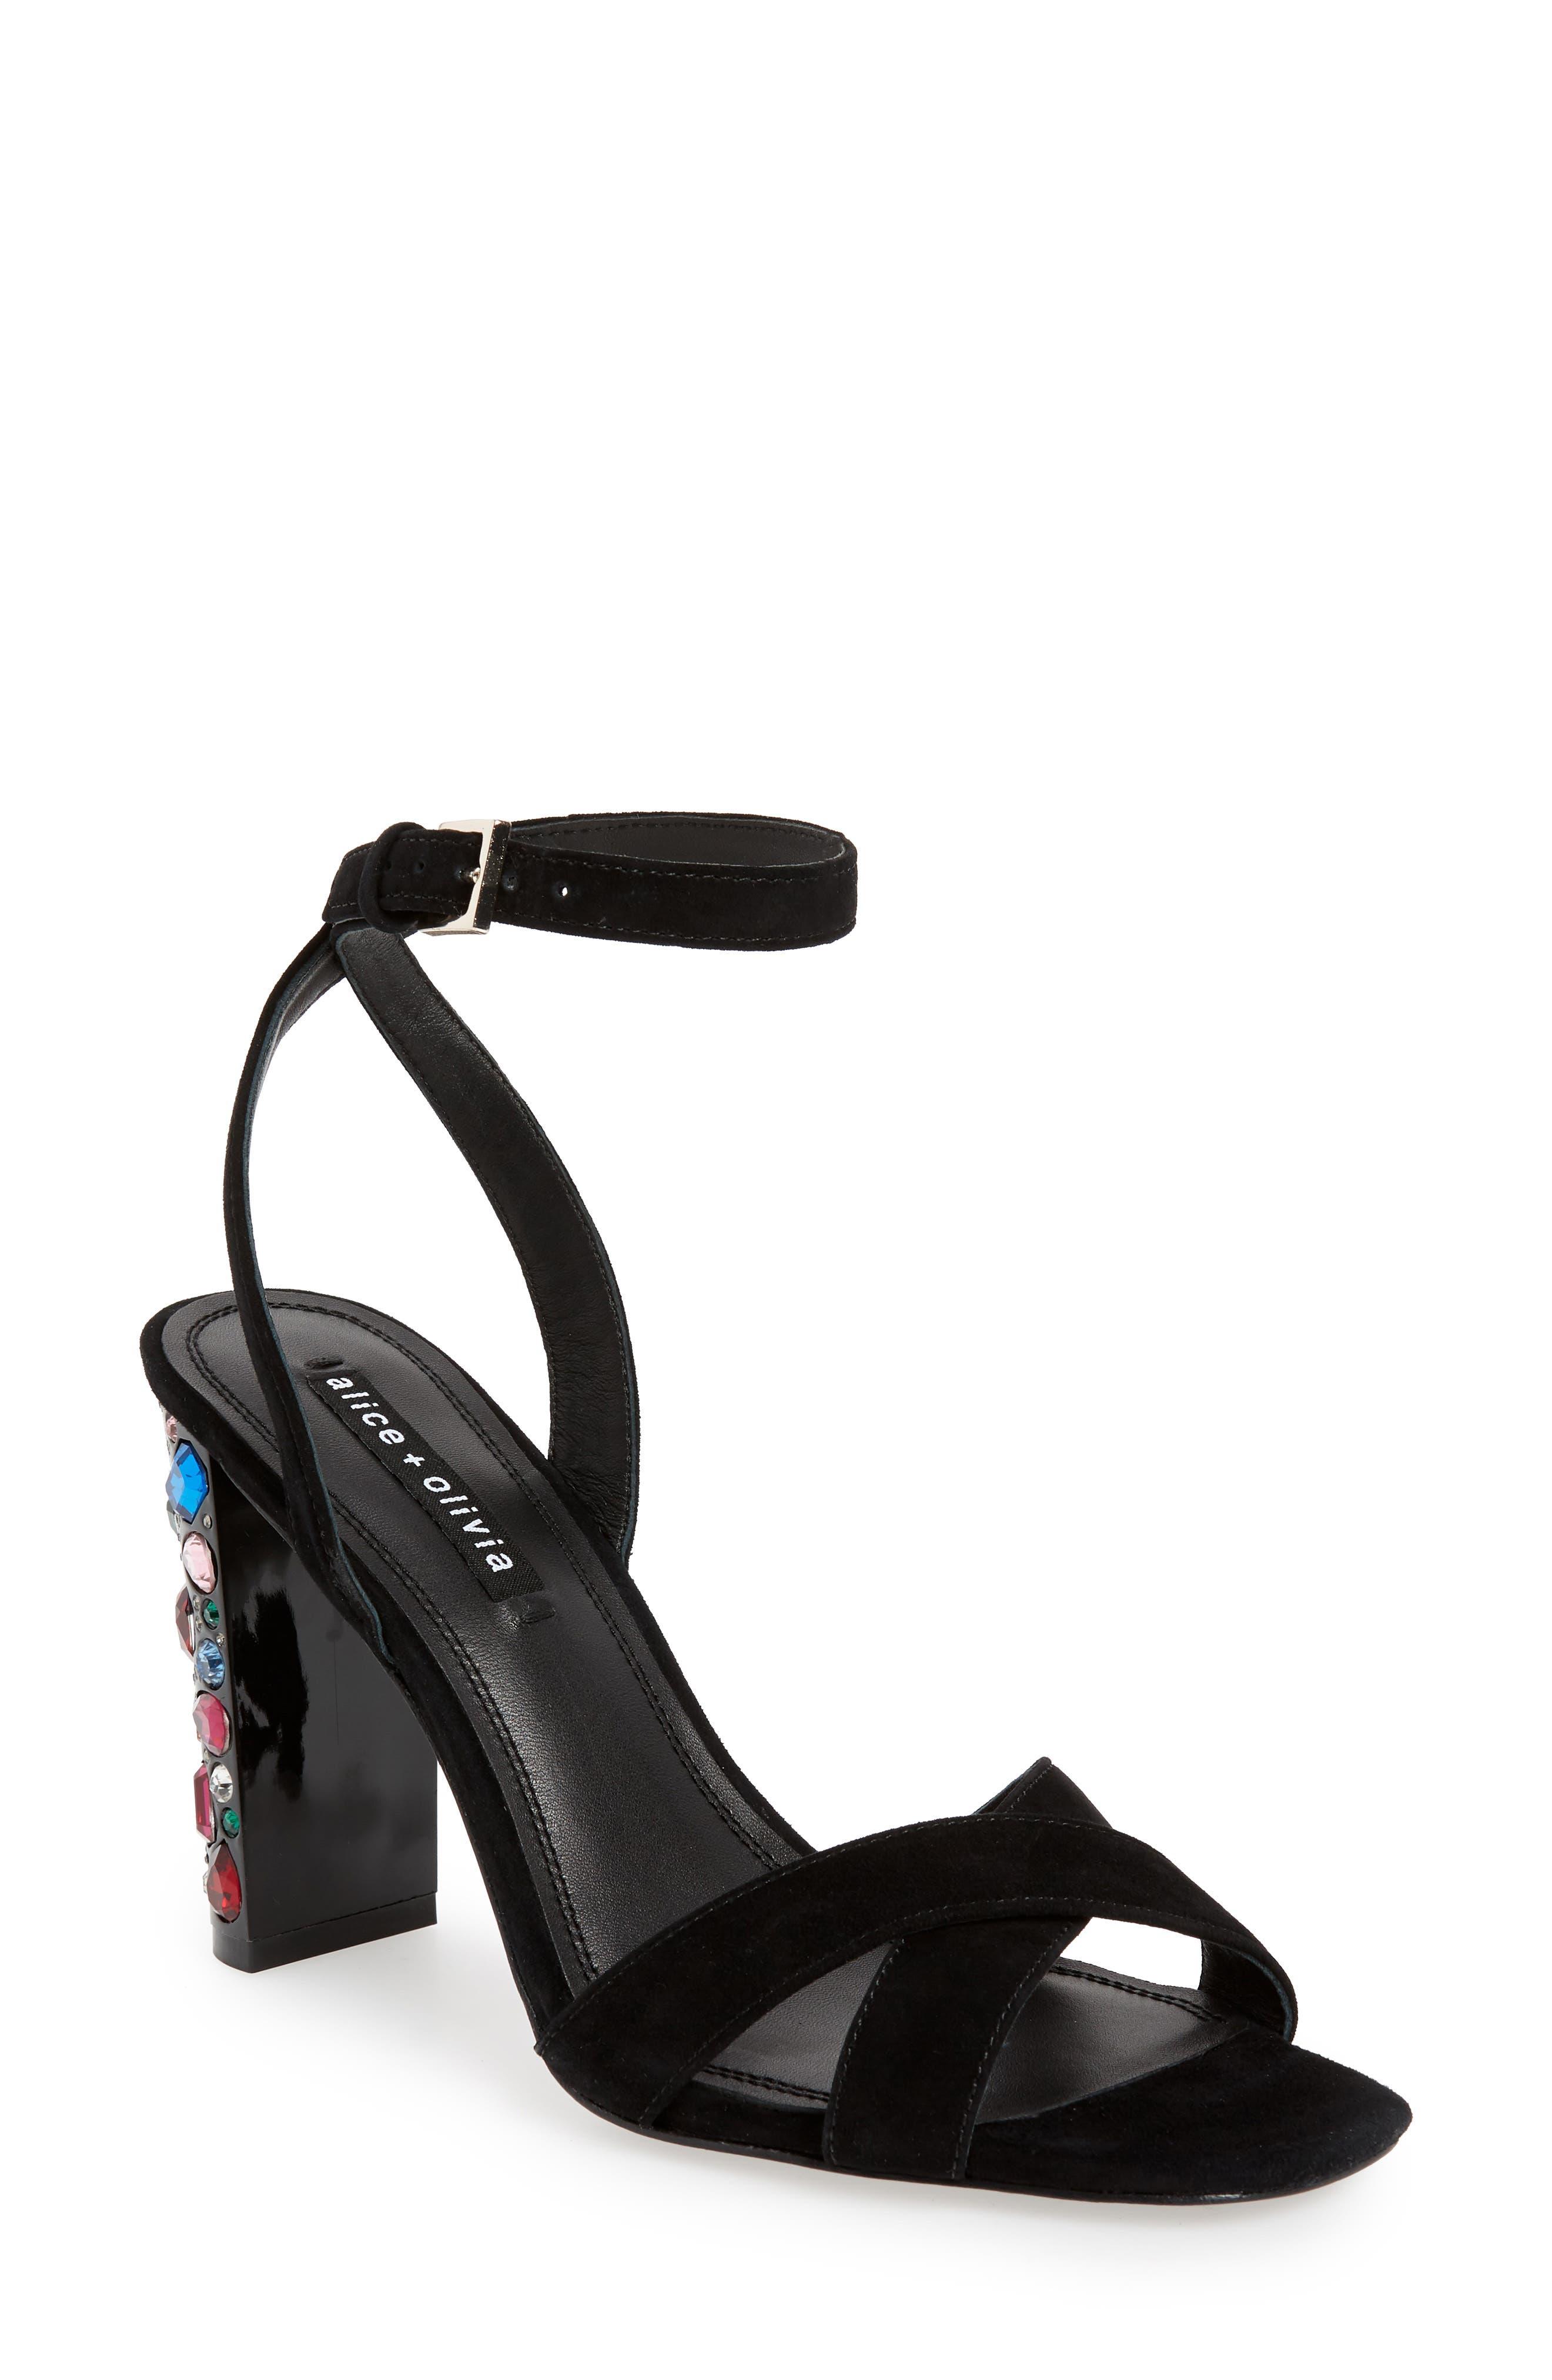 ALICE + OLIVIA, Renia Crystal Heel Sandal, Main thumbnail 1, color, BLACK